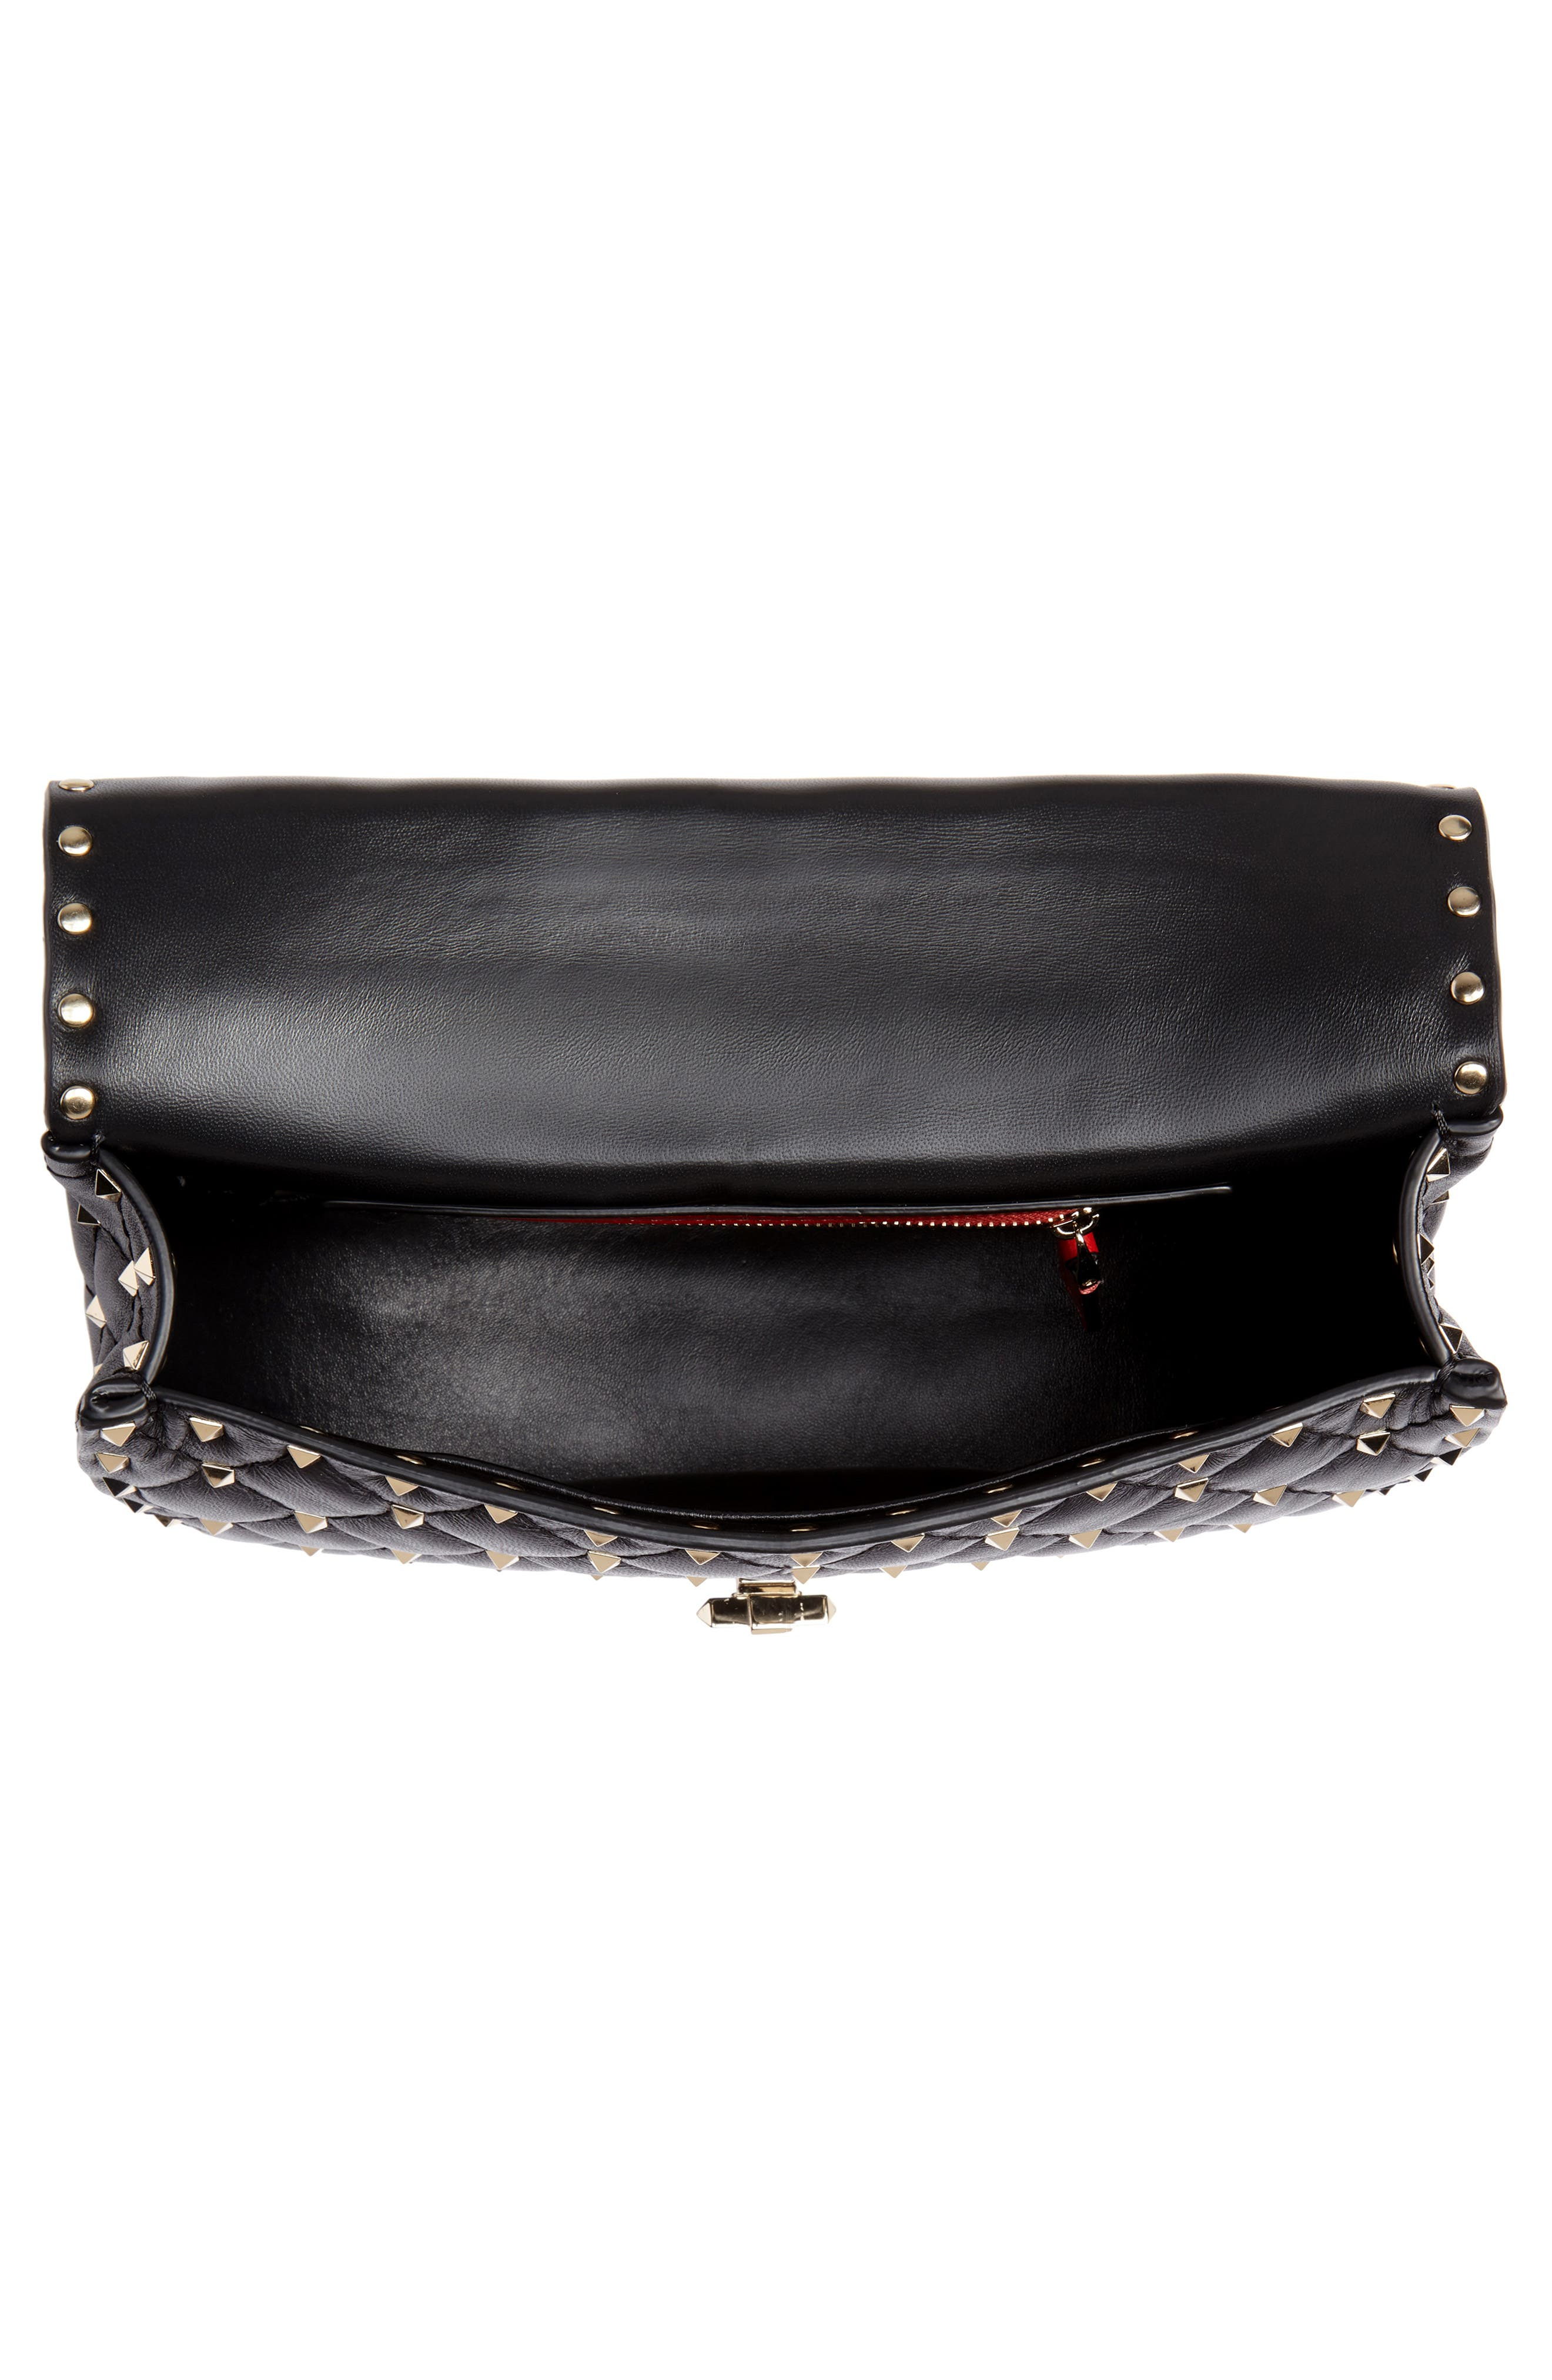 VALENTINO GARAVANI, Rockstud Spike Leather Saddle Bag, Alternate thumbnail 4, color, NERO